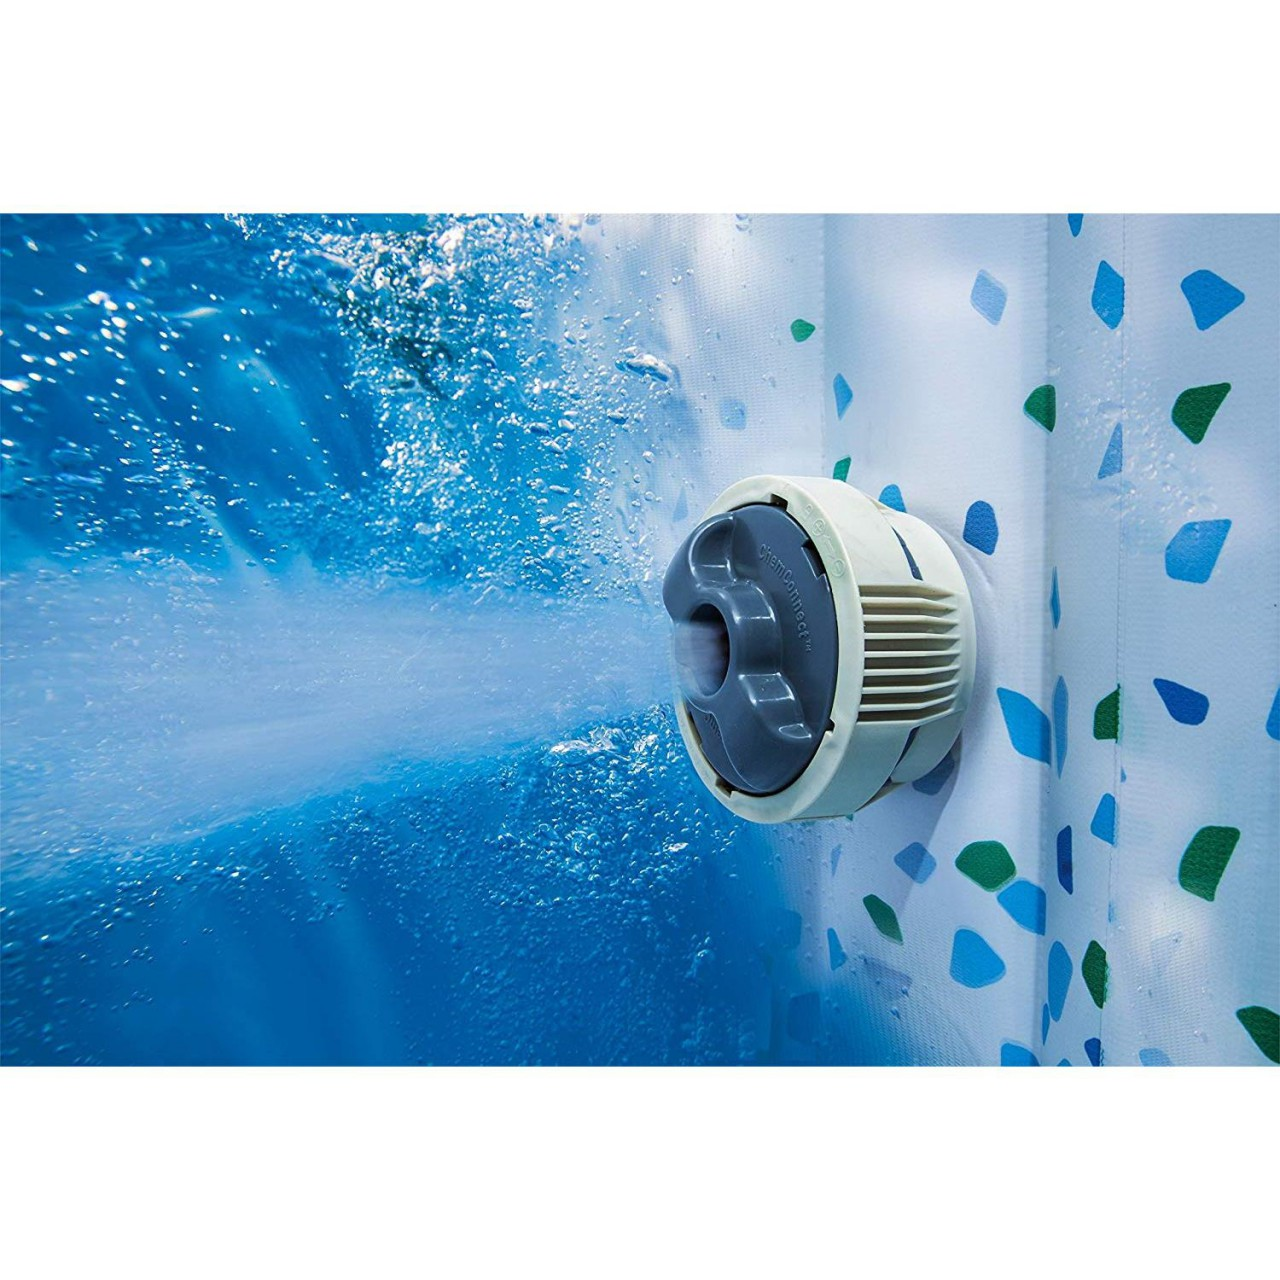 Bestway 54138 Whirlpool Lay Z Spa Hawaii HydroJet Pro Heizung 180x71cm